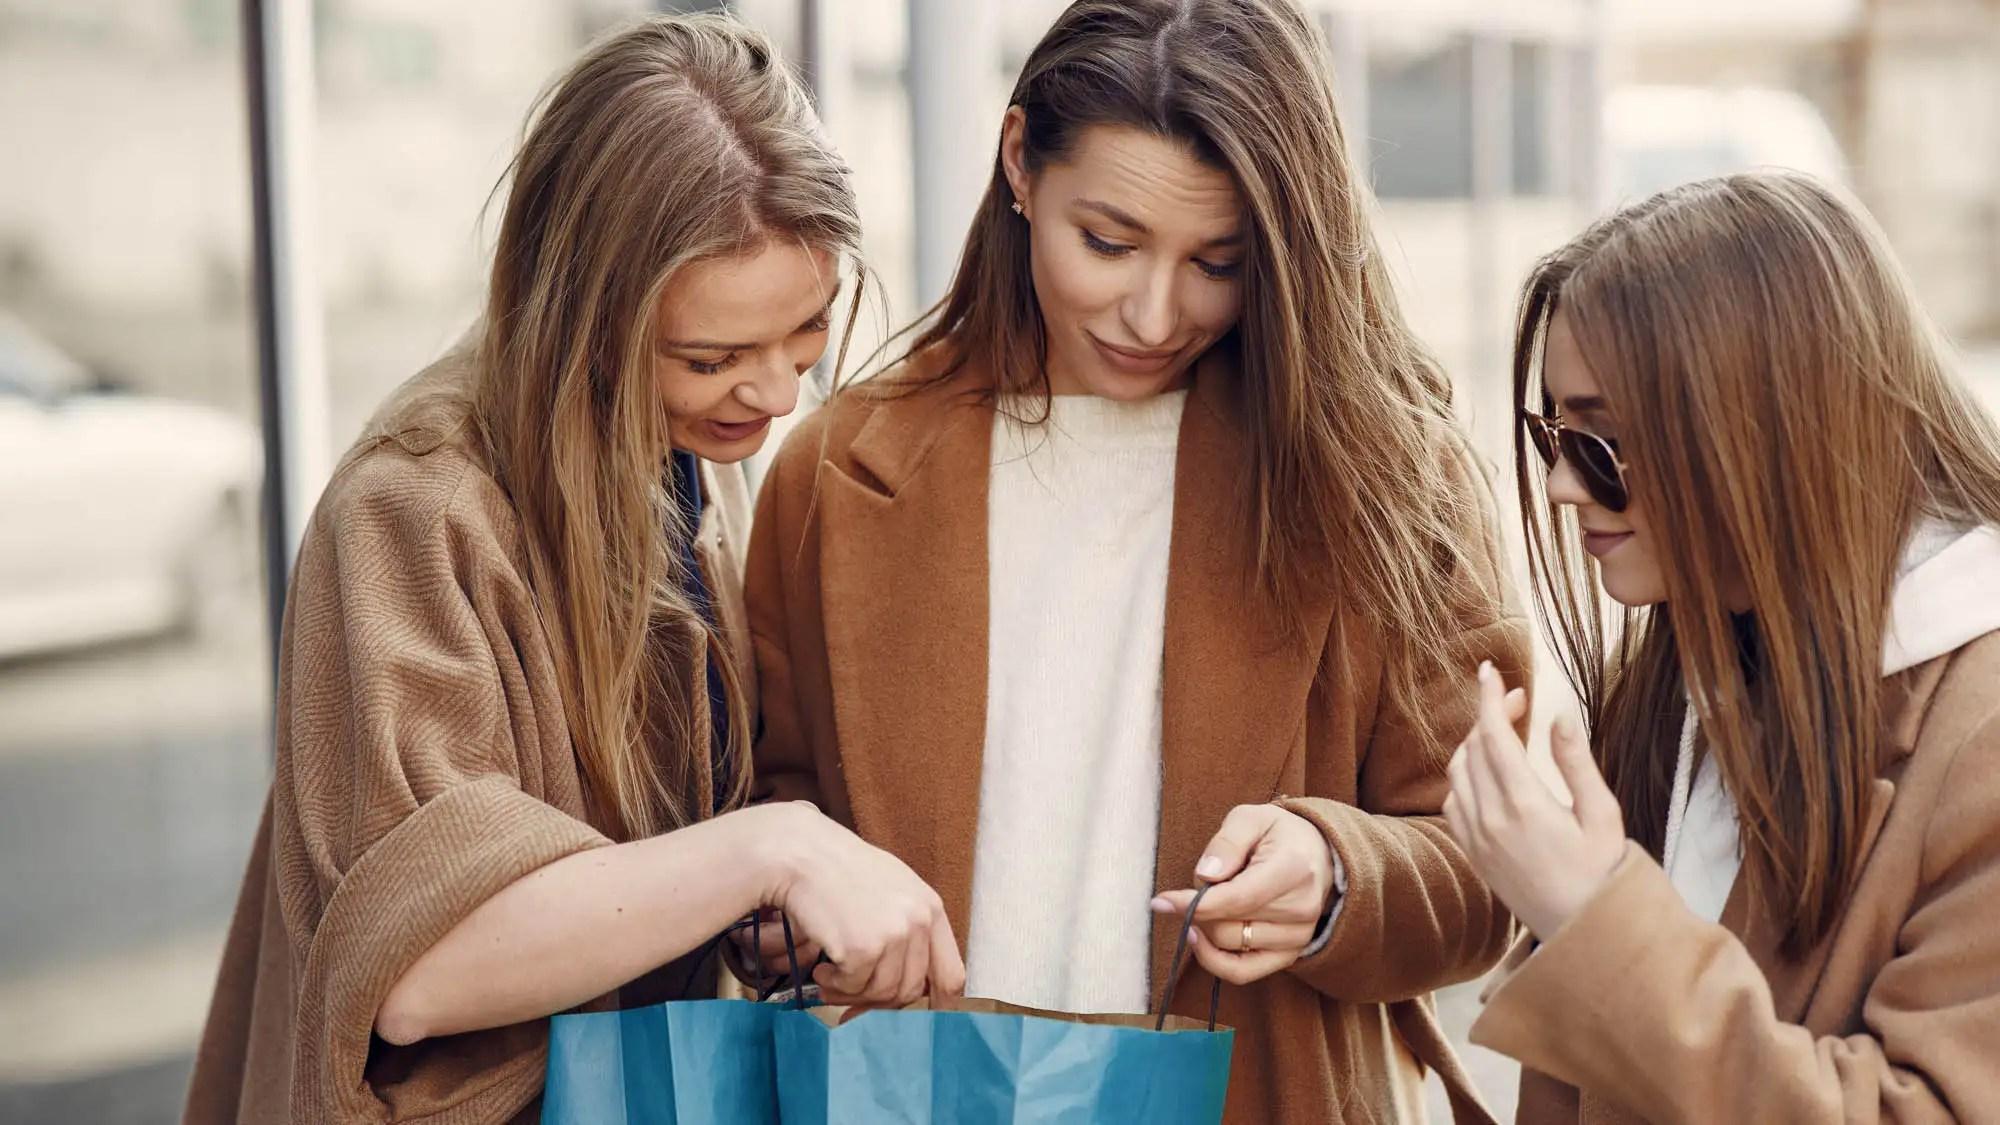 Girls on a shopping. Friends walks. Women with a shopping bags.